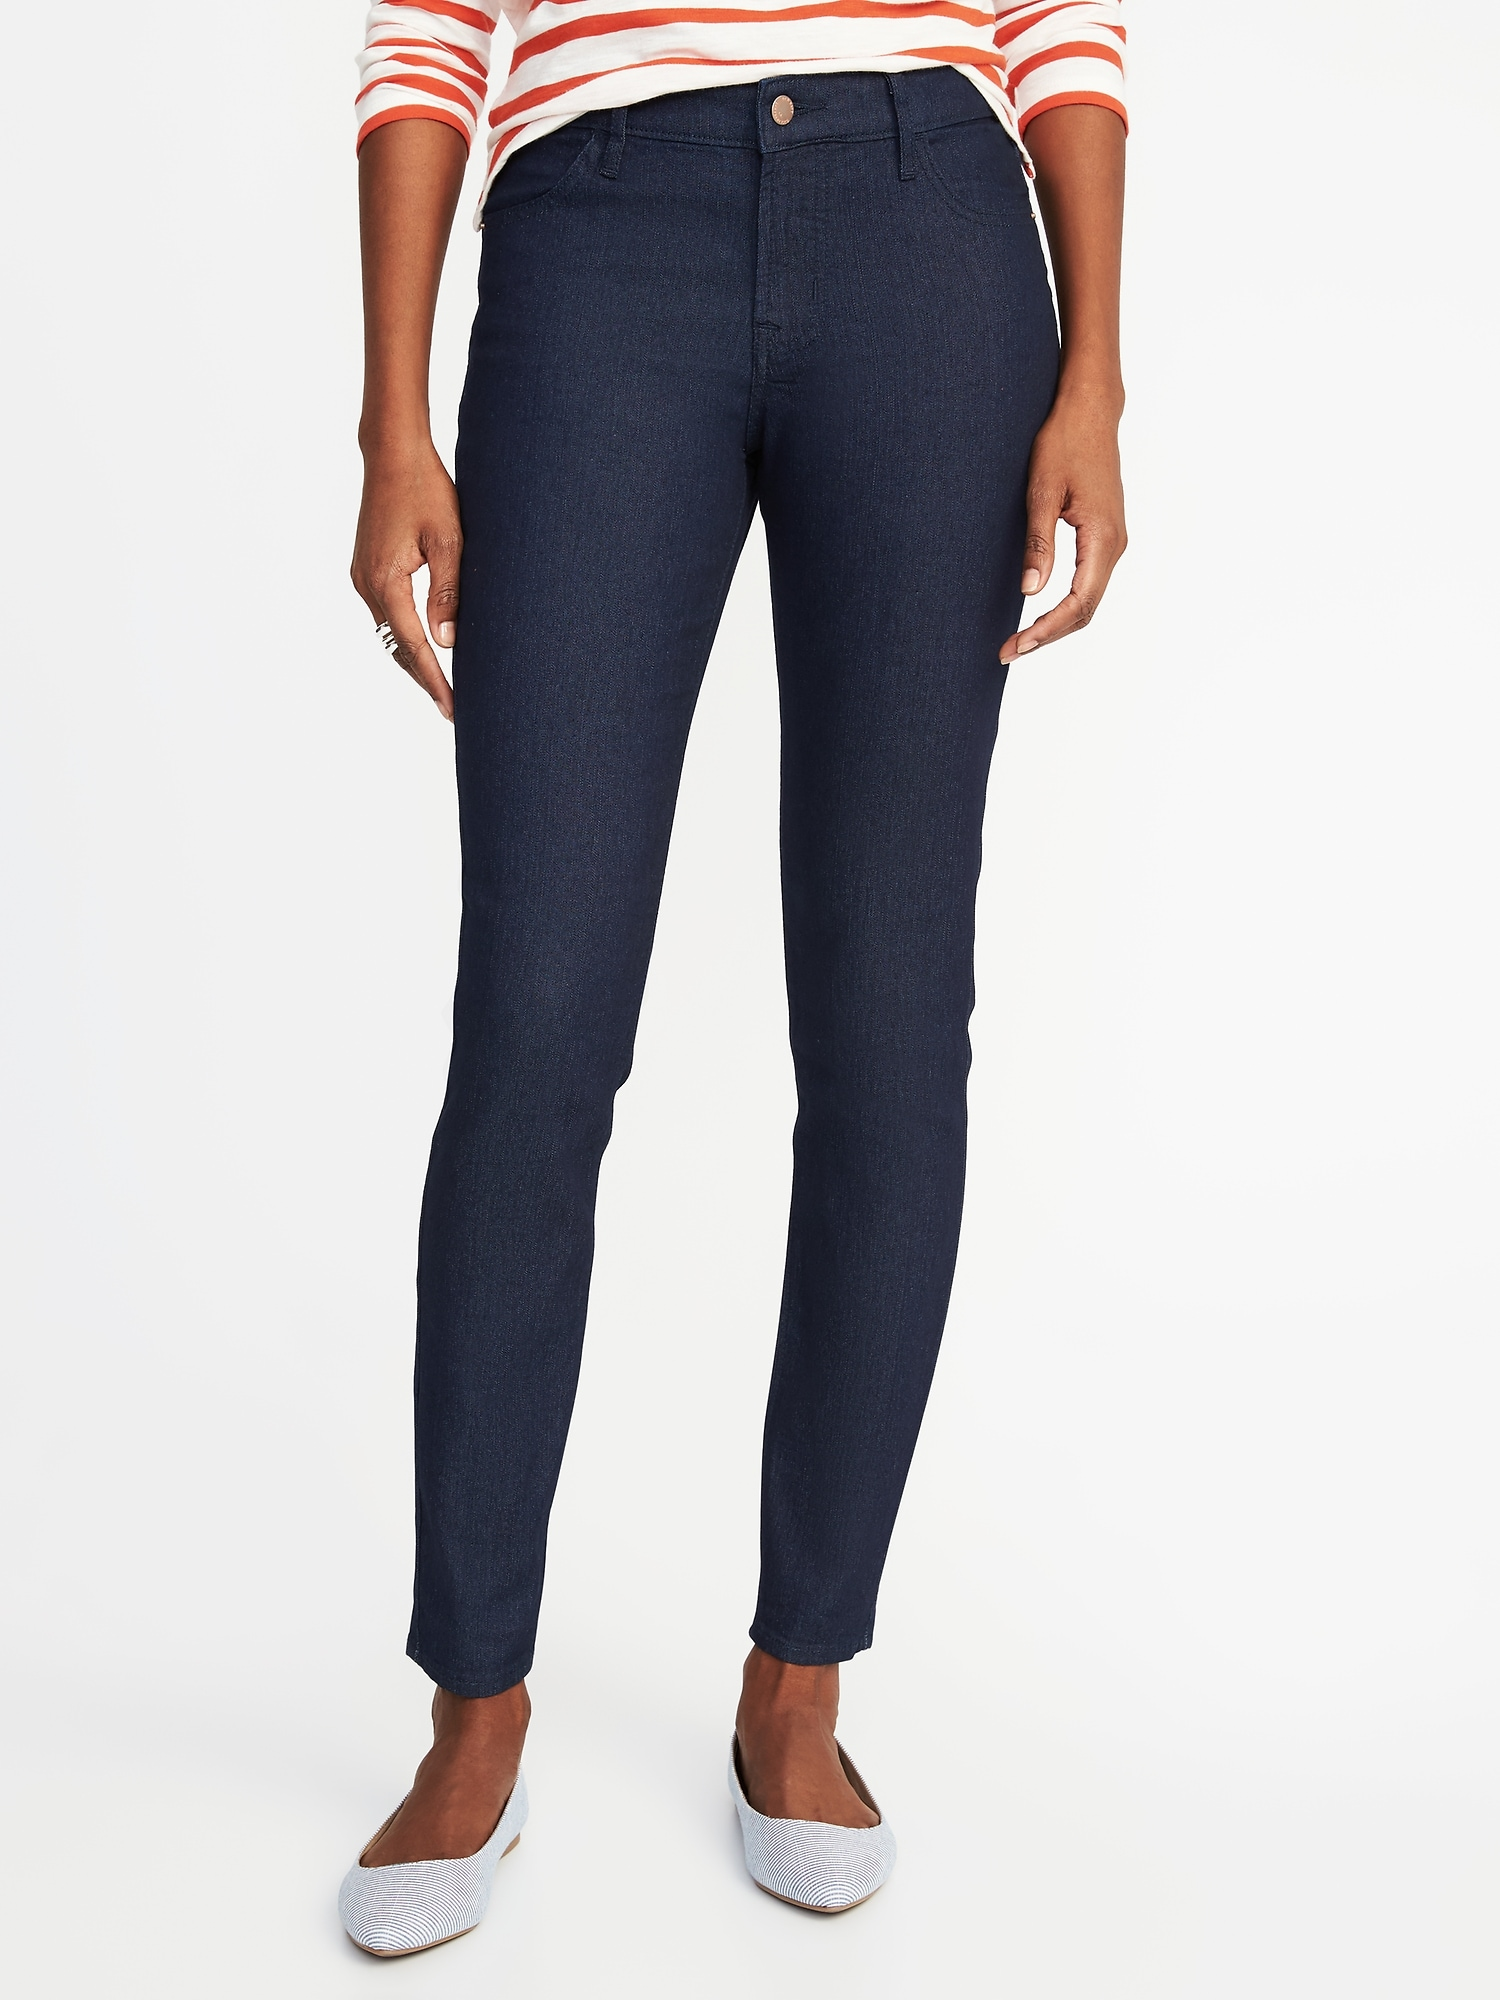 19e8283ba67dd Mid-Rise Super Skinny Jeans for Women